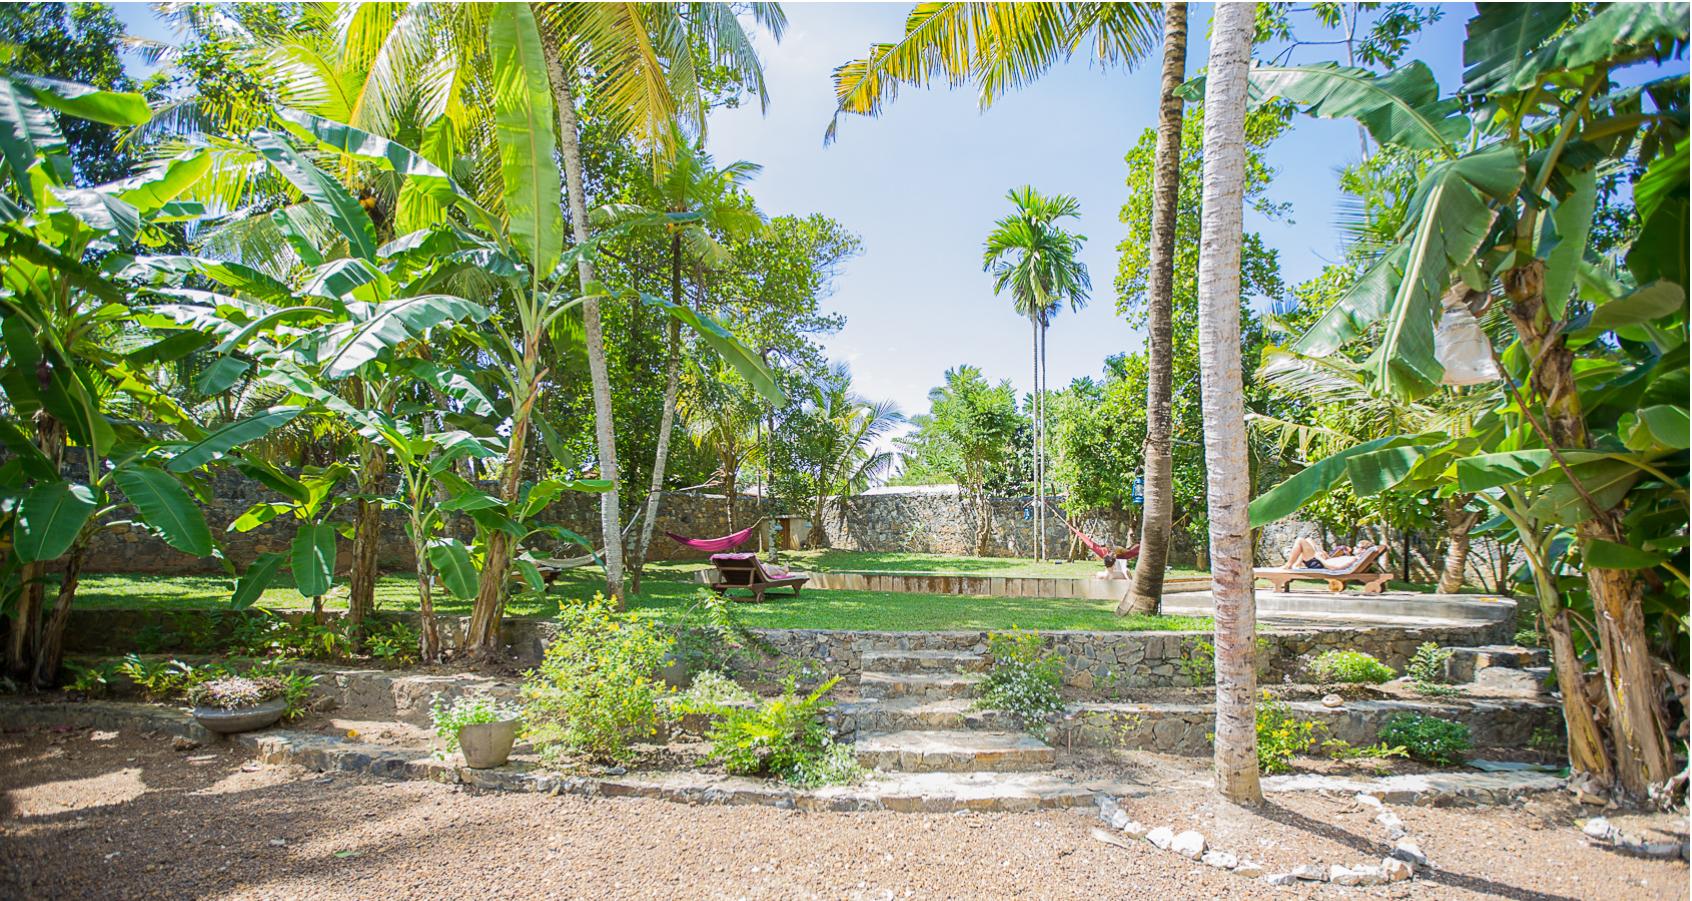 Tropical garden with hammocks.